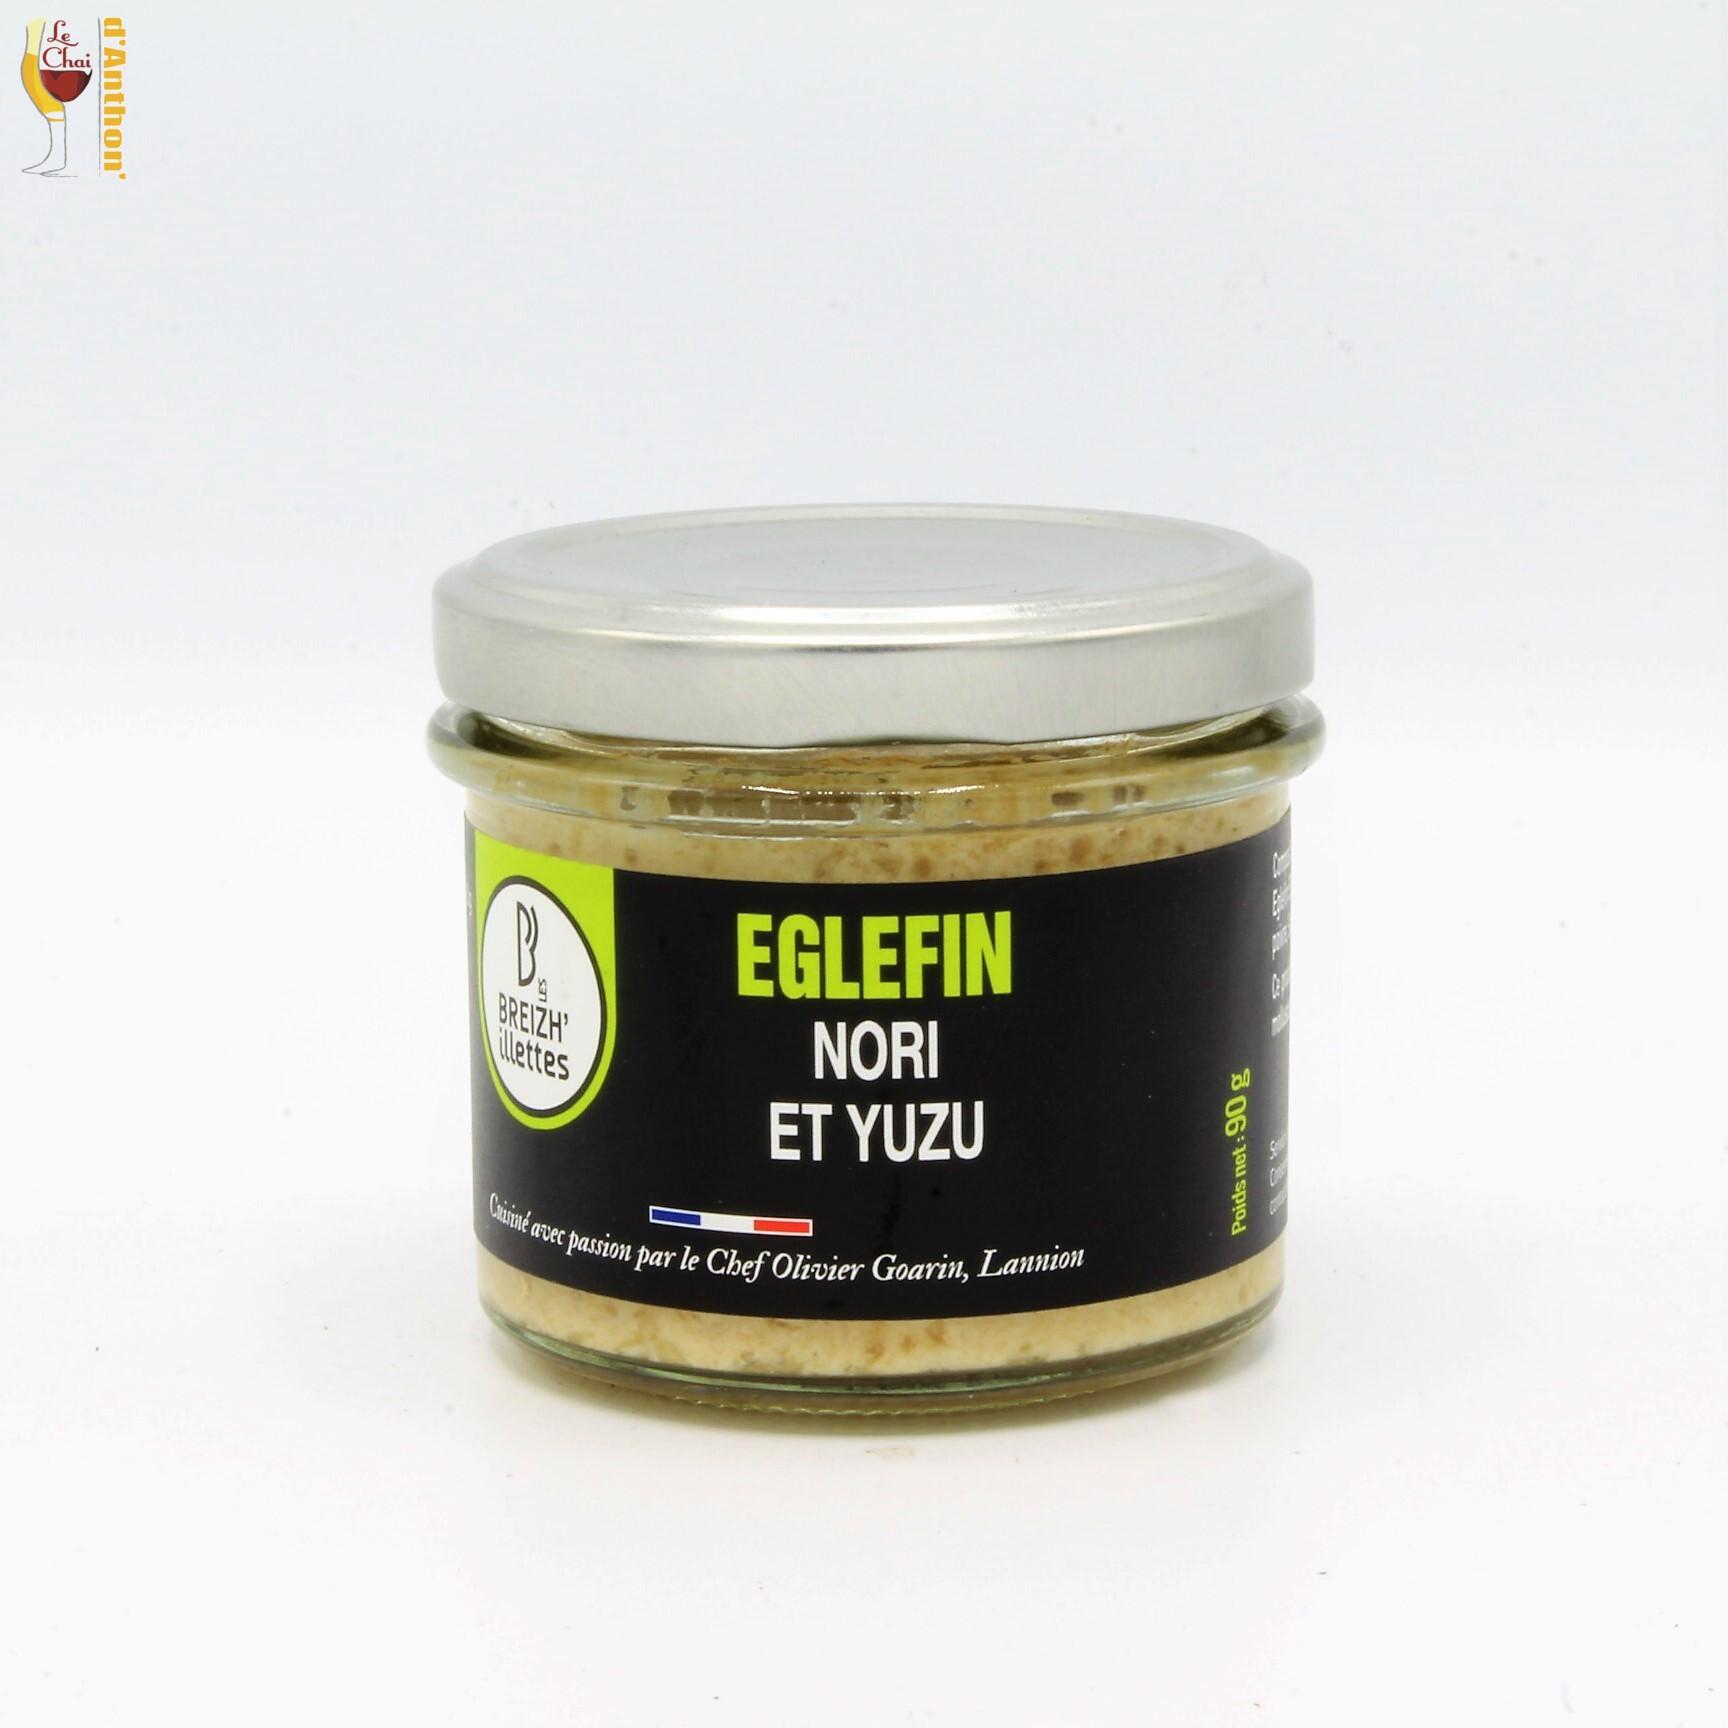 Conserverie Eglefin Au Nori Et Yuzu 90 Gr Breizh' Illettes